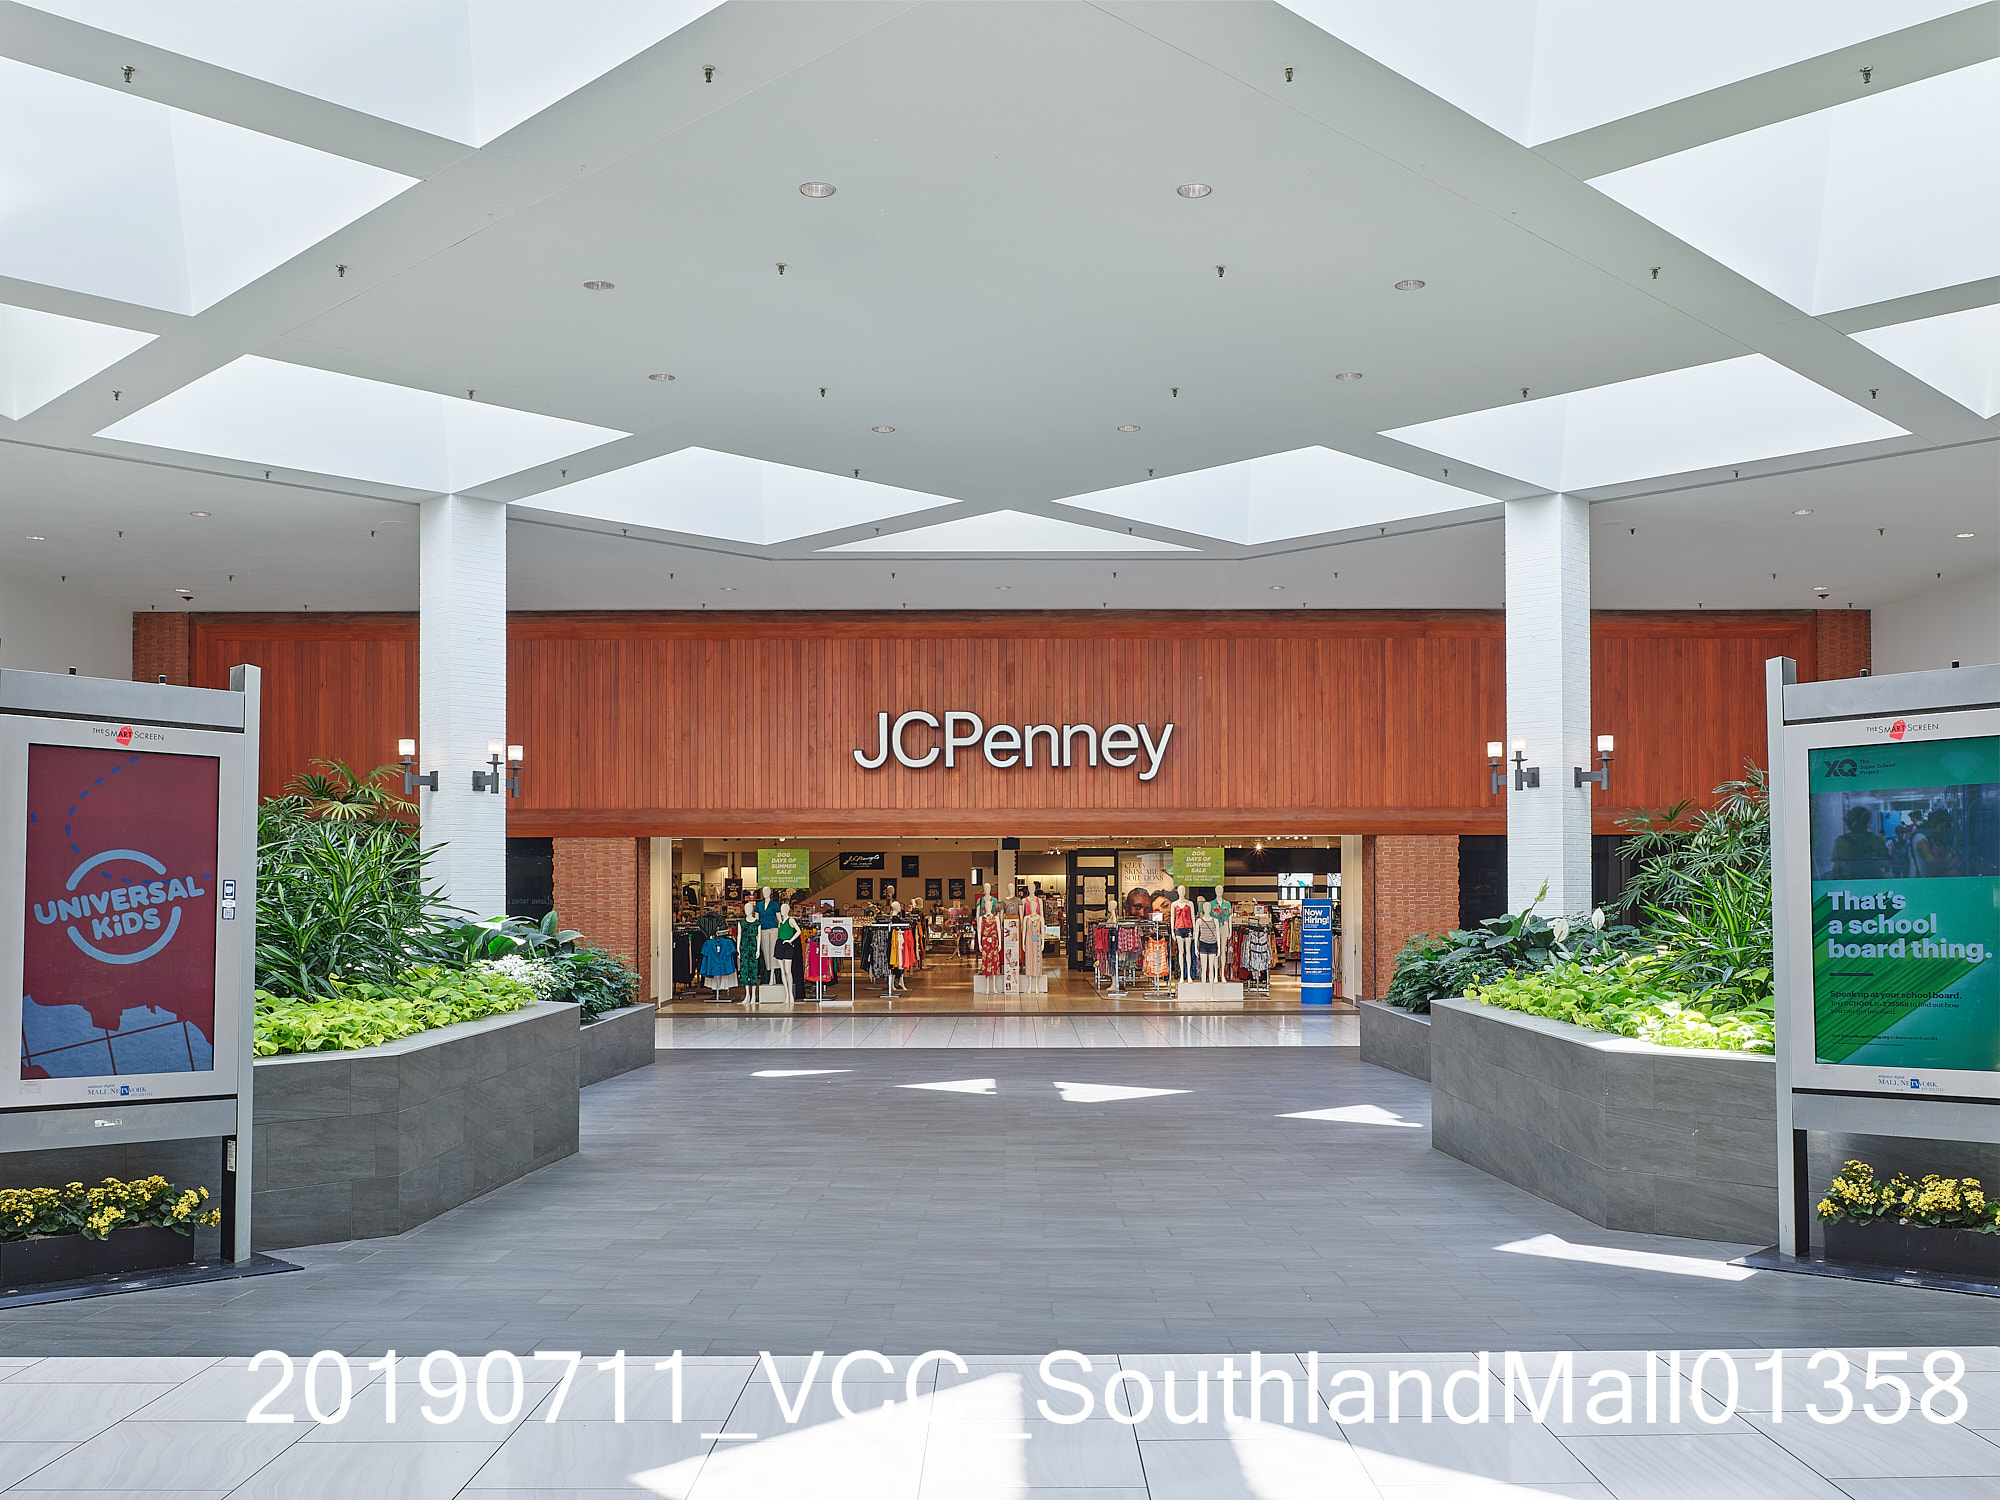 20190711_VCC_SouthlandMall01358.jpg